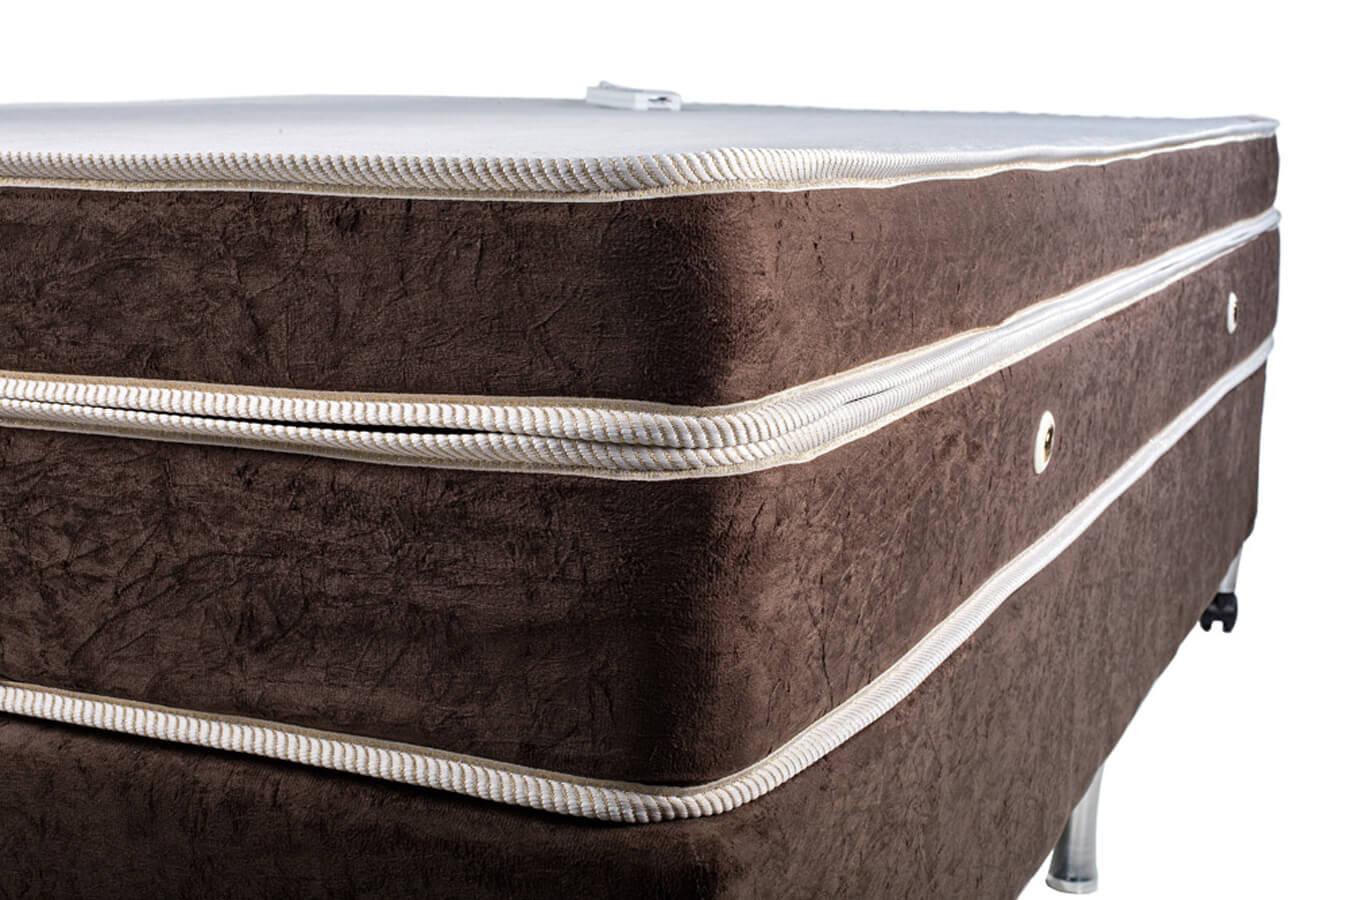 Colchão Magnético Casal 1,38x1,88x27cm Kenko Premium Plus   - Kenko Premium Colchões